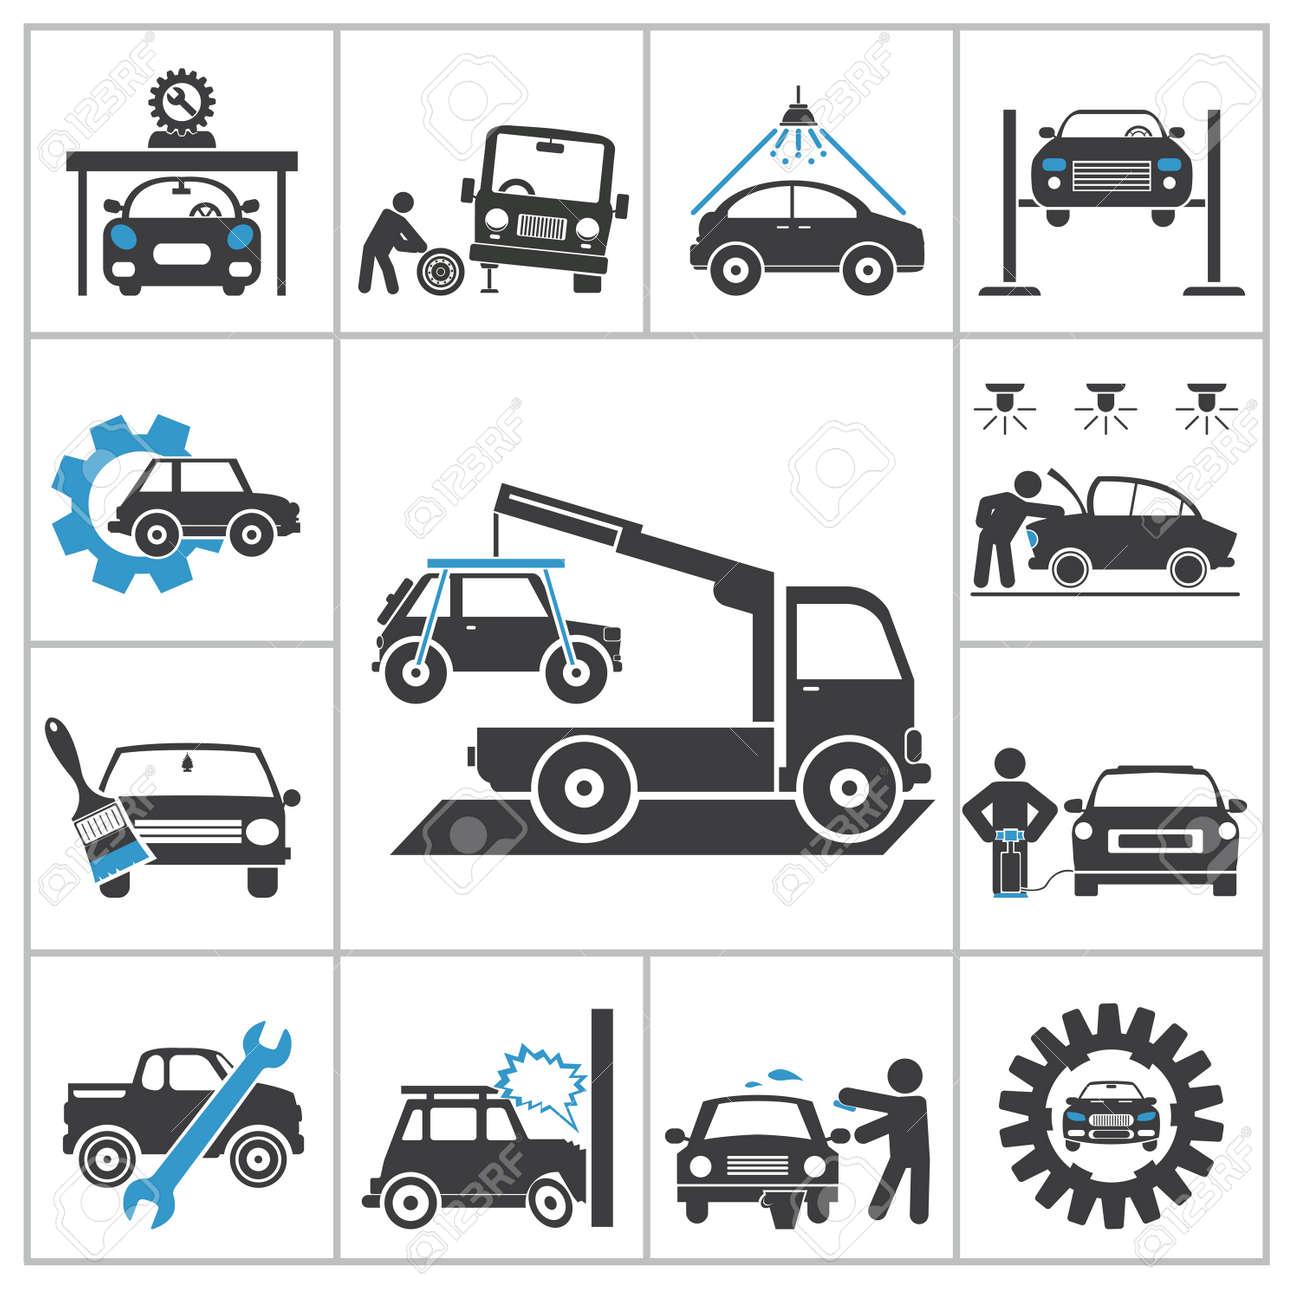 Design car repair workshop - Auto Repair Icons Vector Set For You Design Stock Vector 24541246